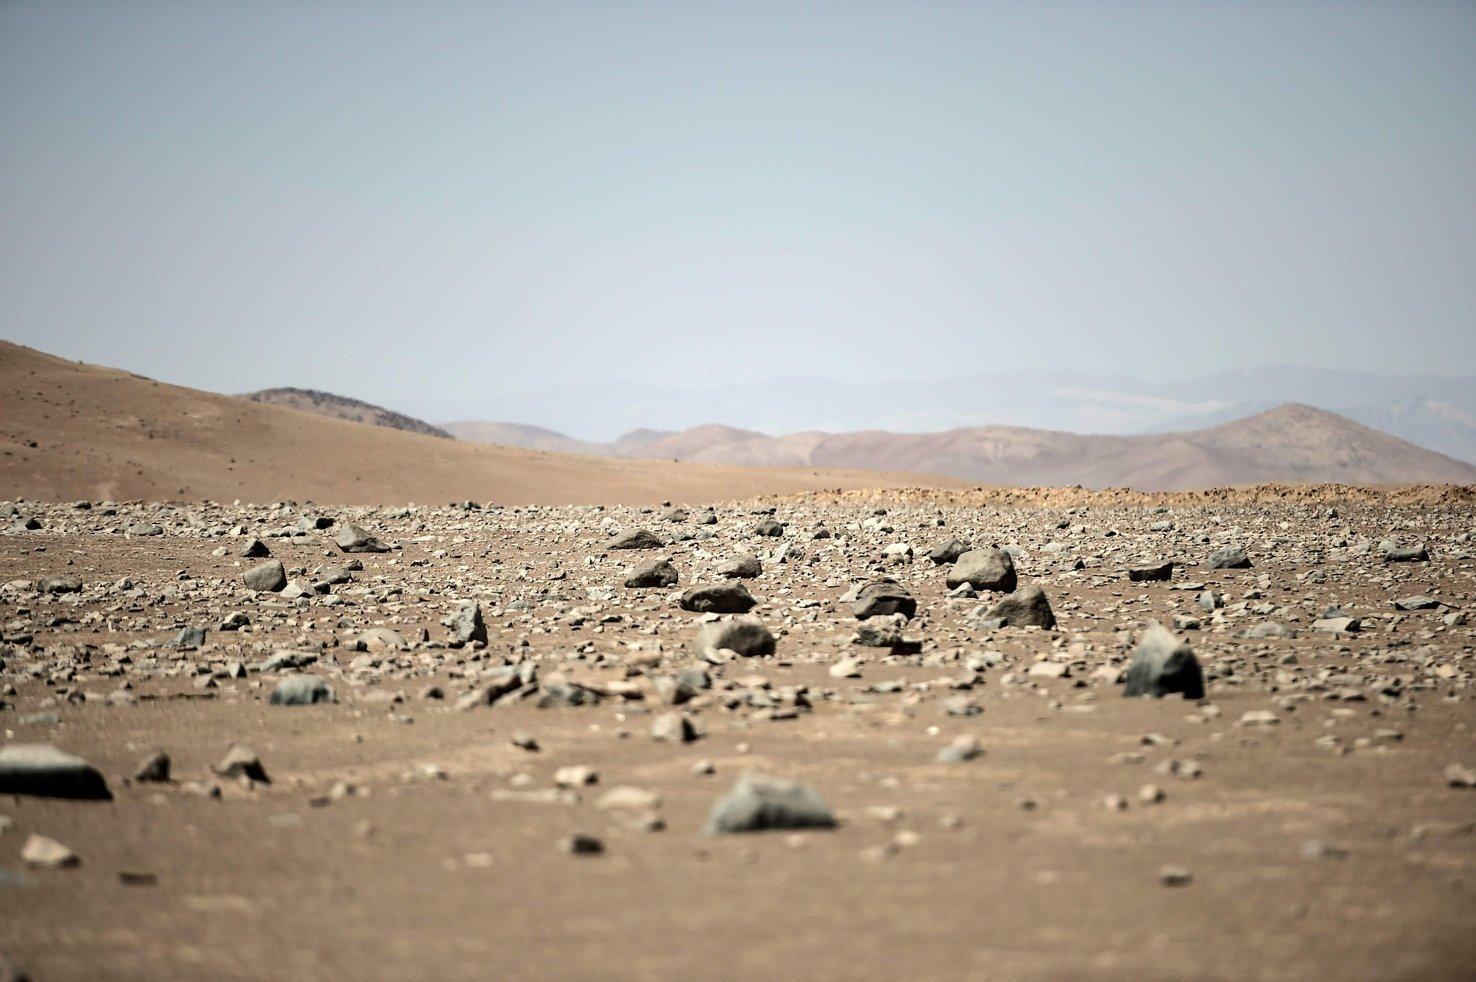 Some 80 kilometers south of Antofagasta, rocks lay in Yungay, Atacama Desert, Chile, March 7, 2017. (AFP Photo)